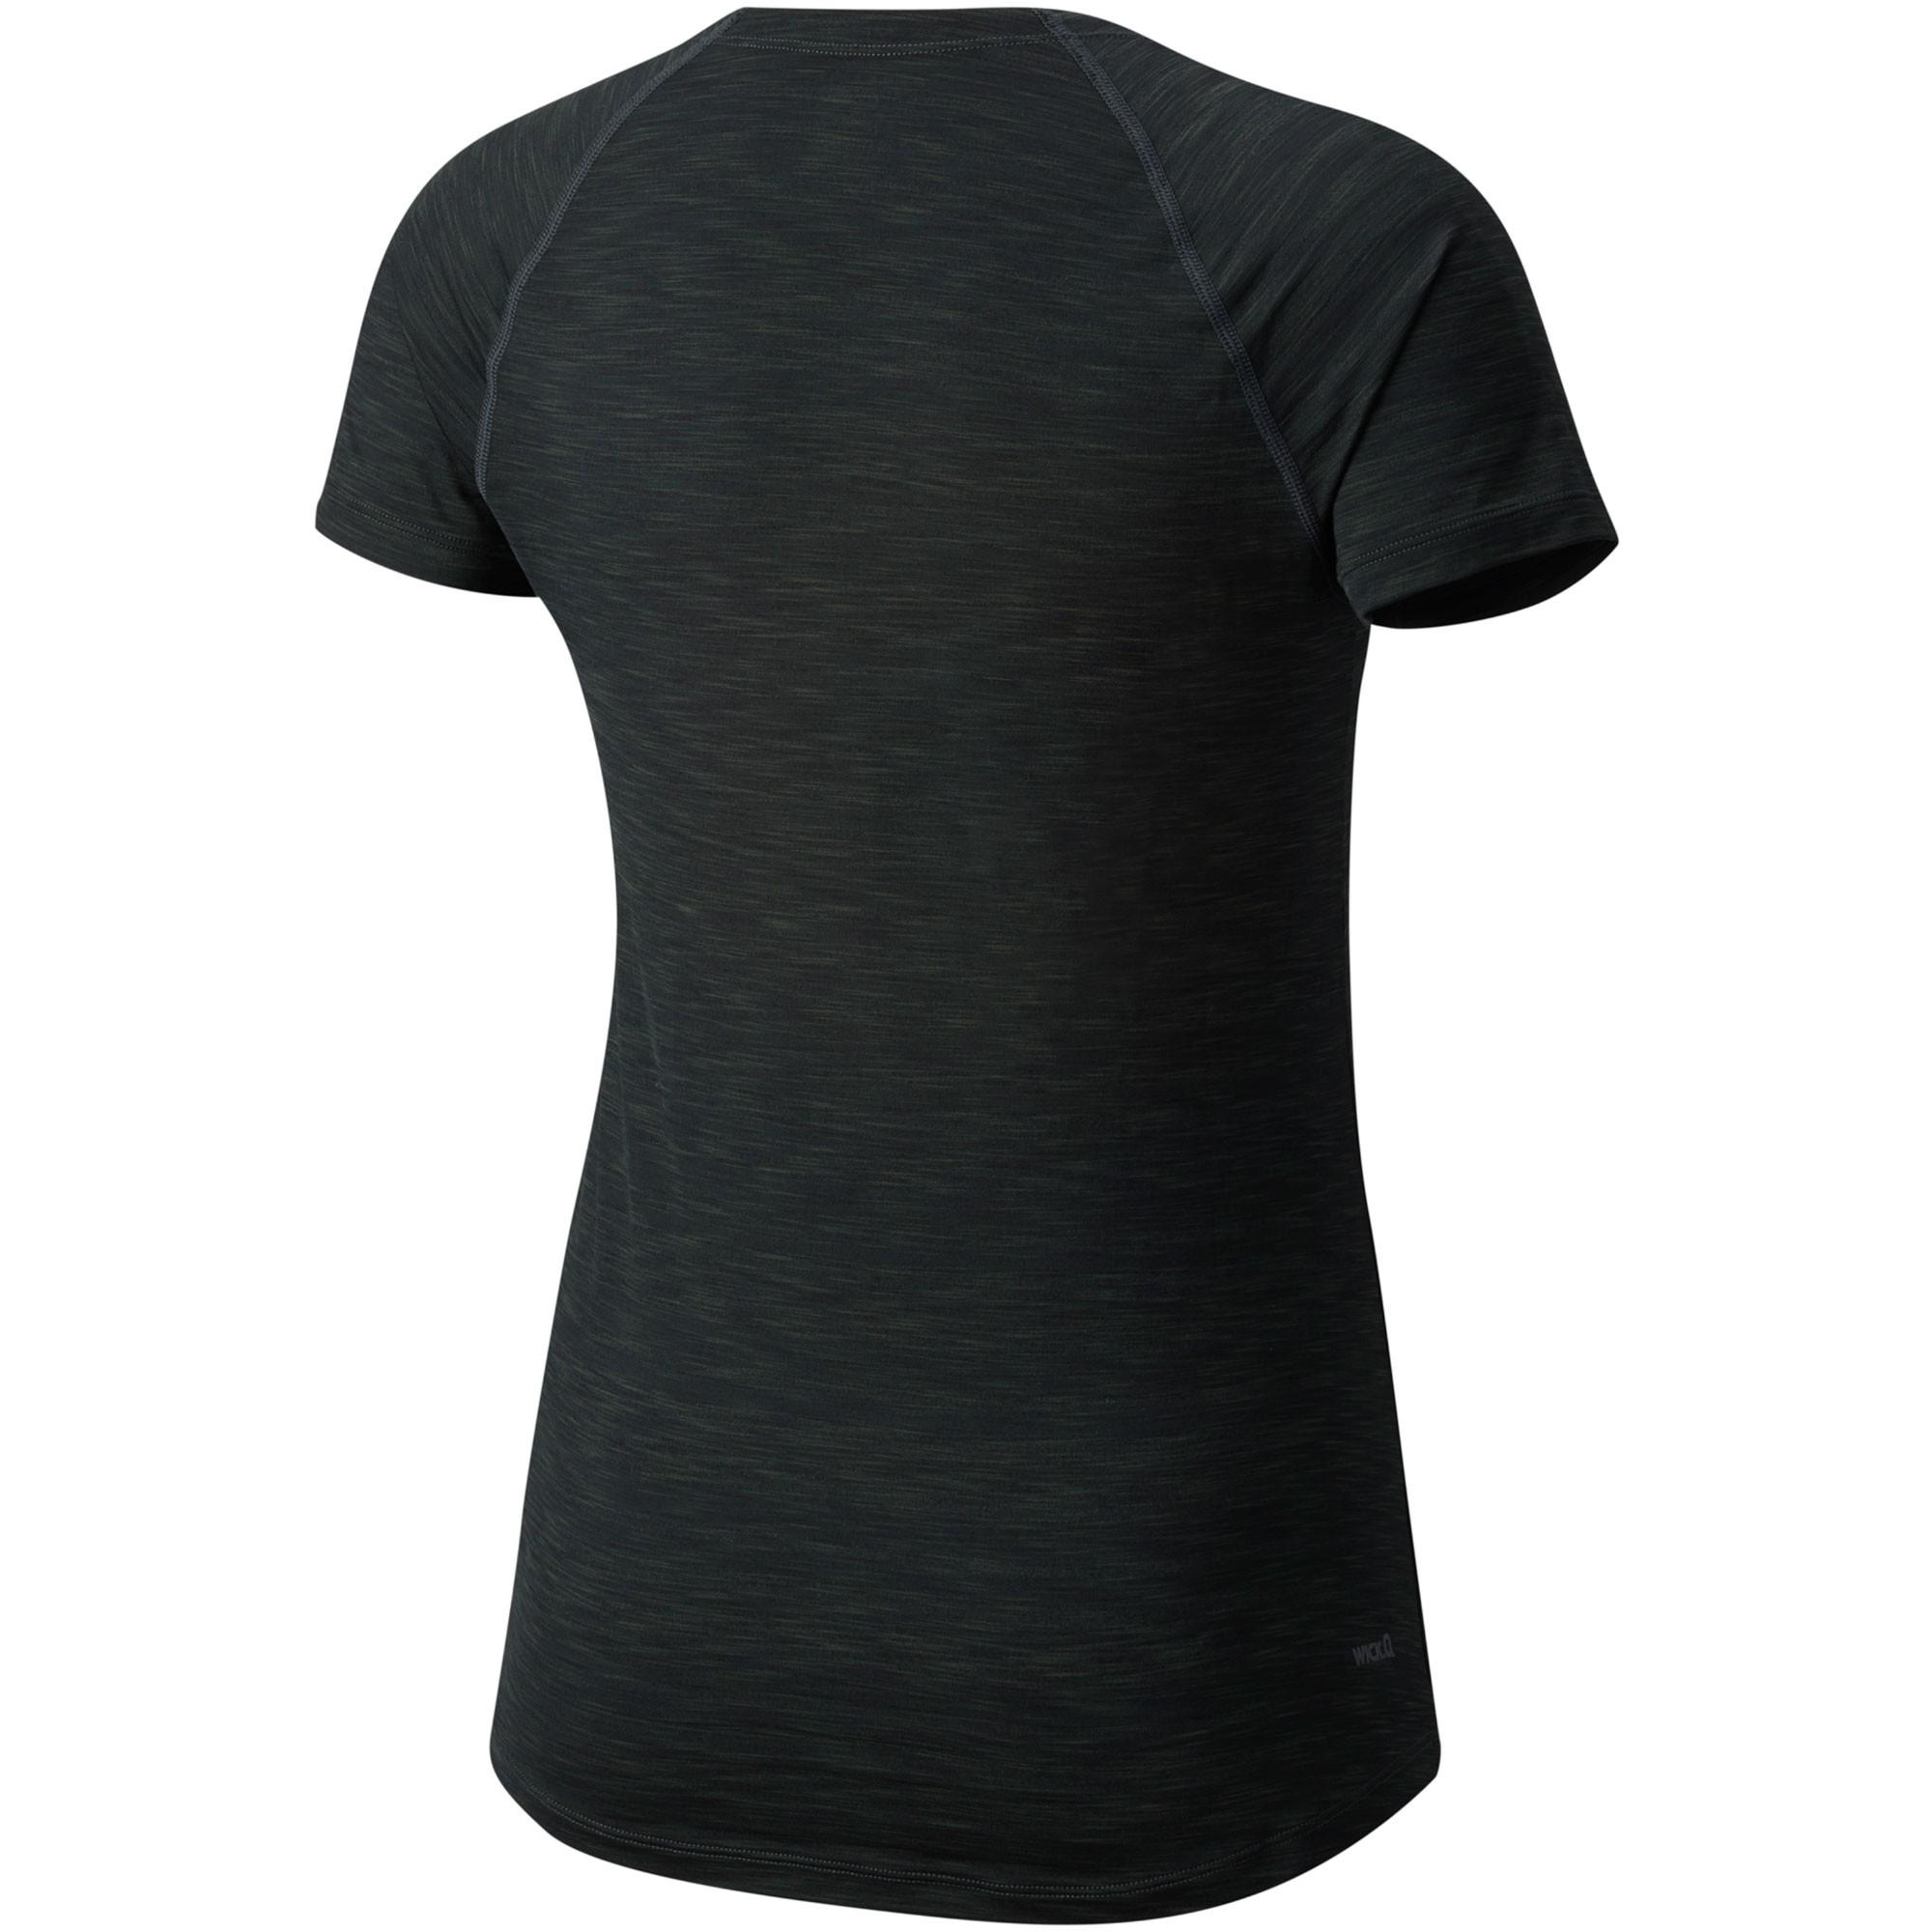 Mountain Hardwear Mighty Stripe Short Sleeve Tee - Stealth Grey